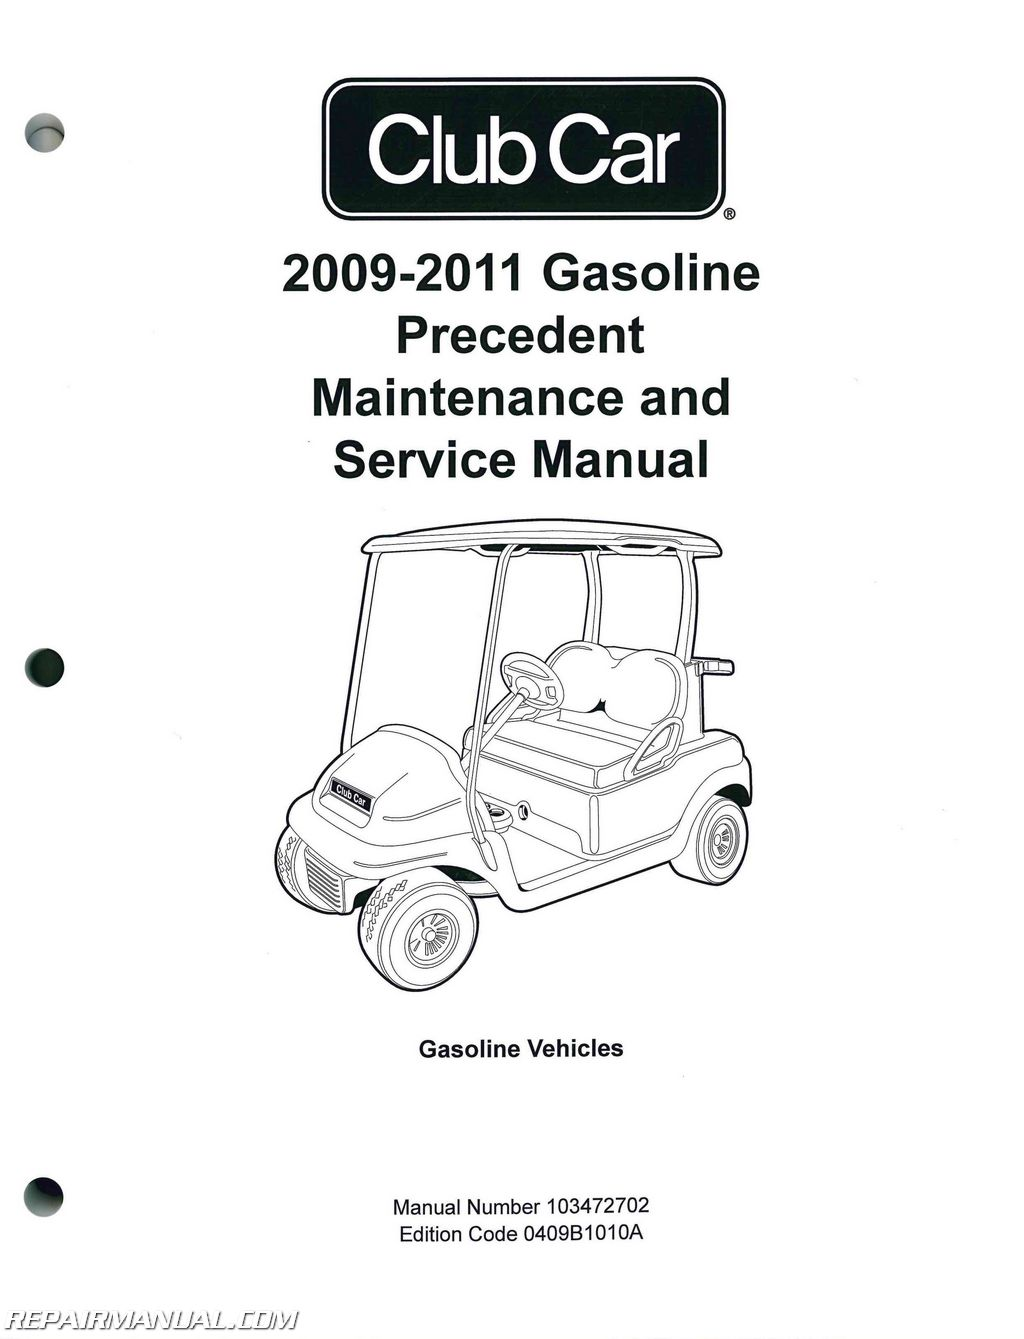 club car carry all 2 gasoline parts manual